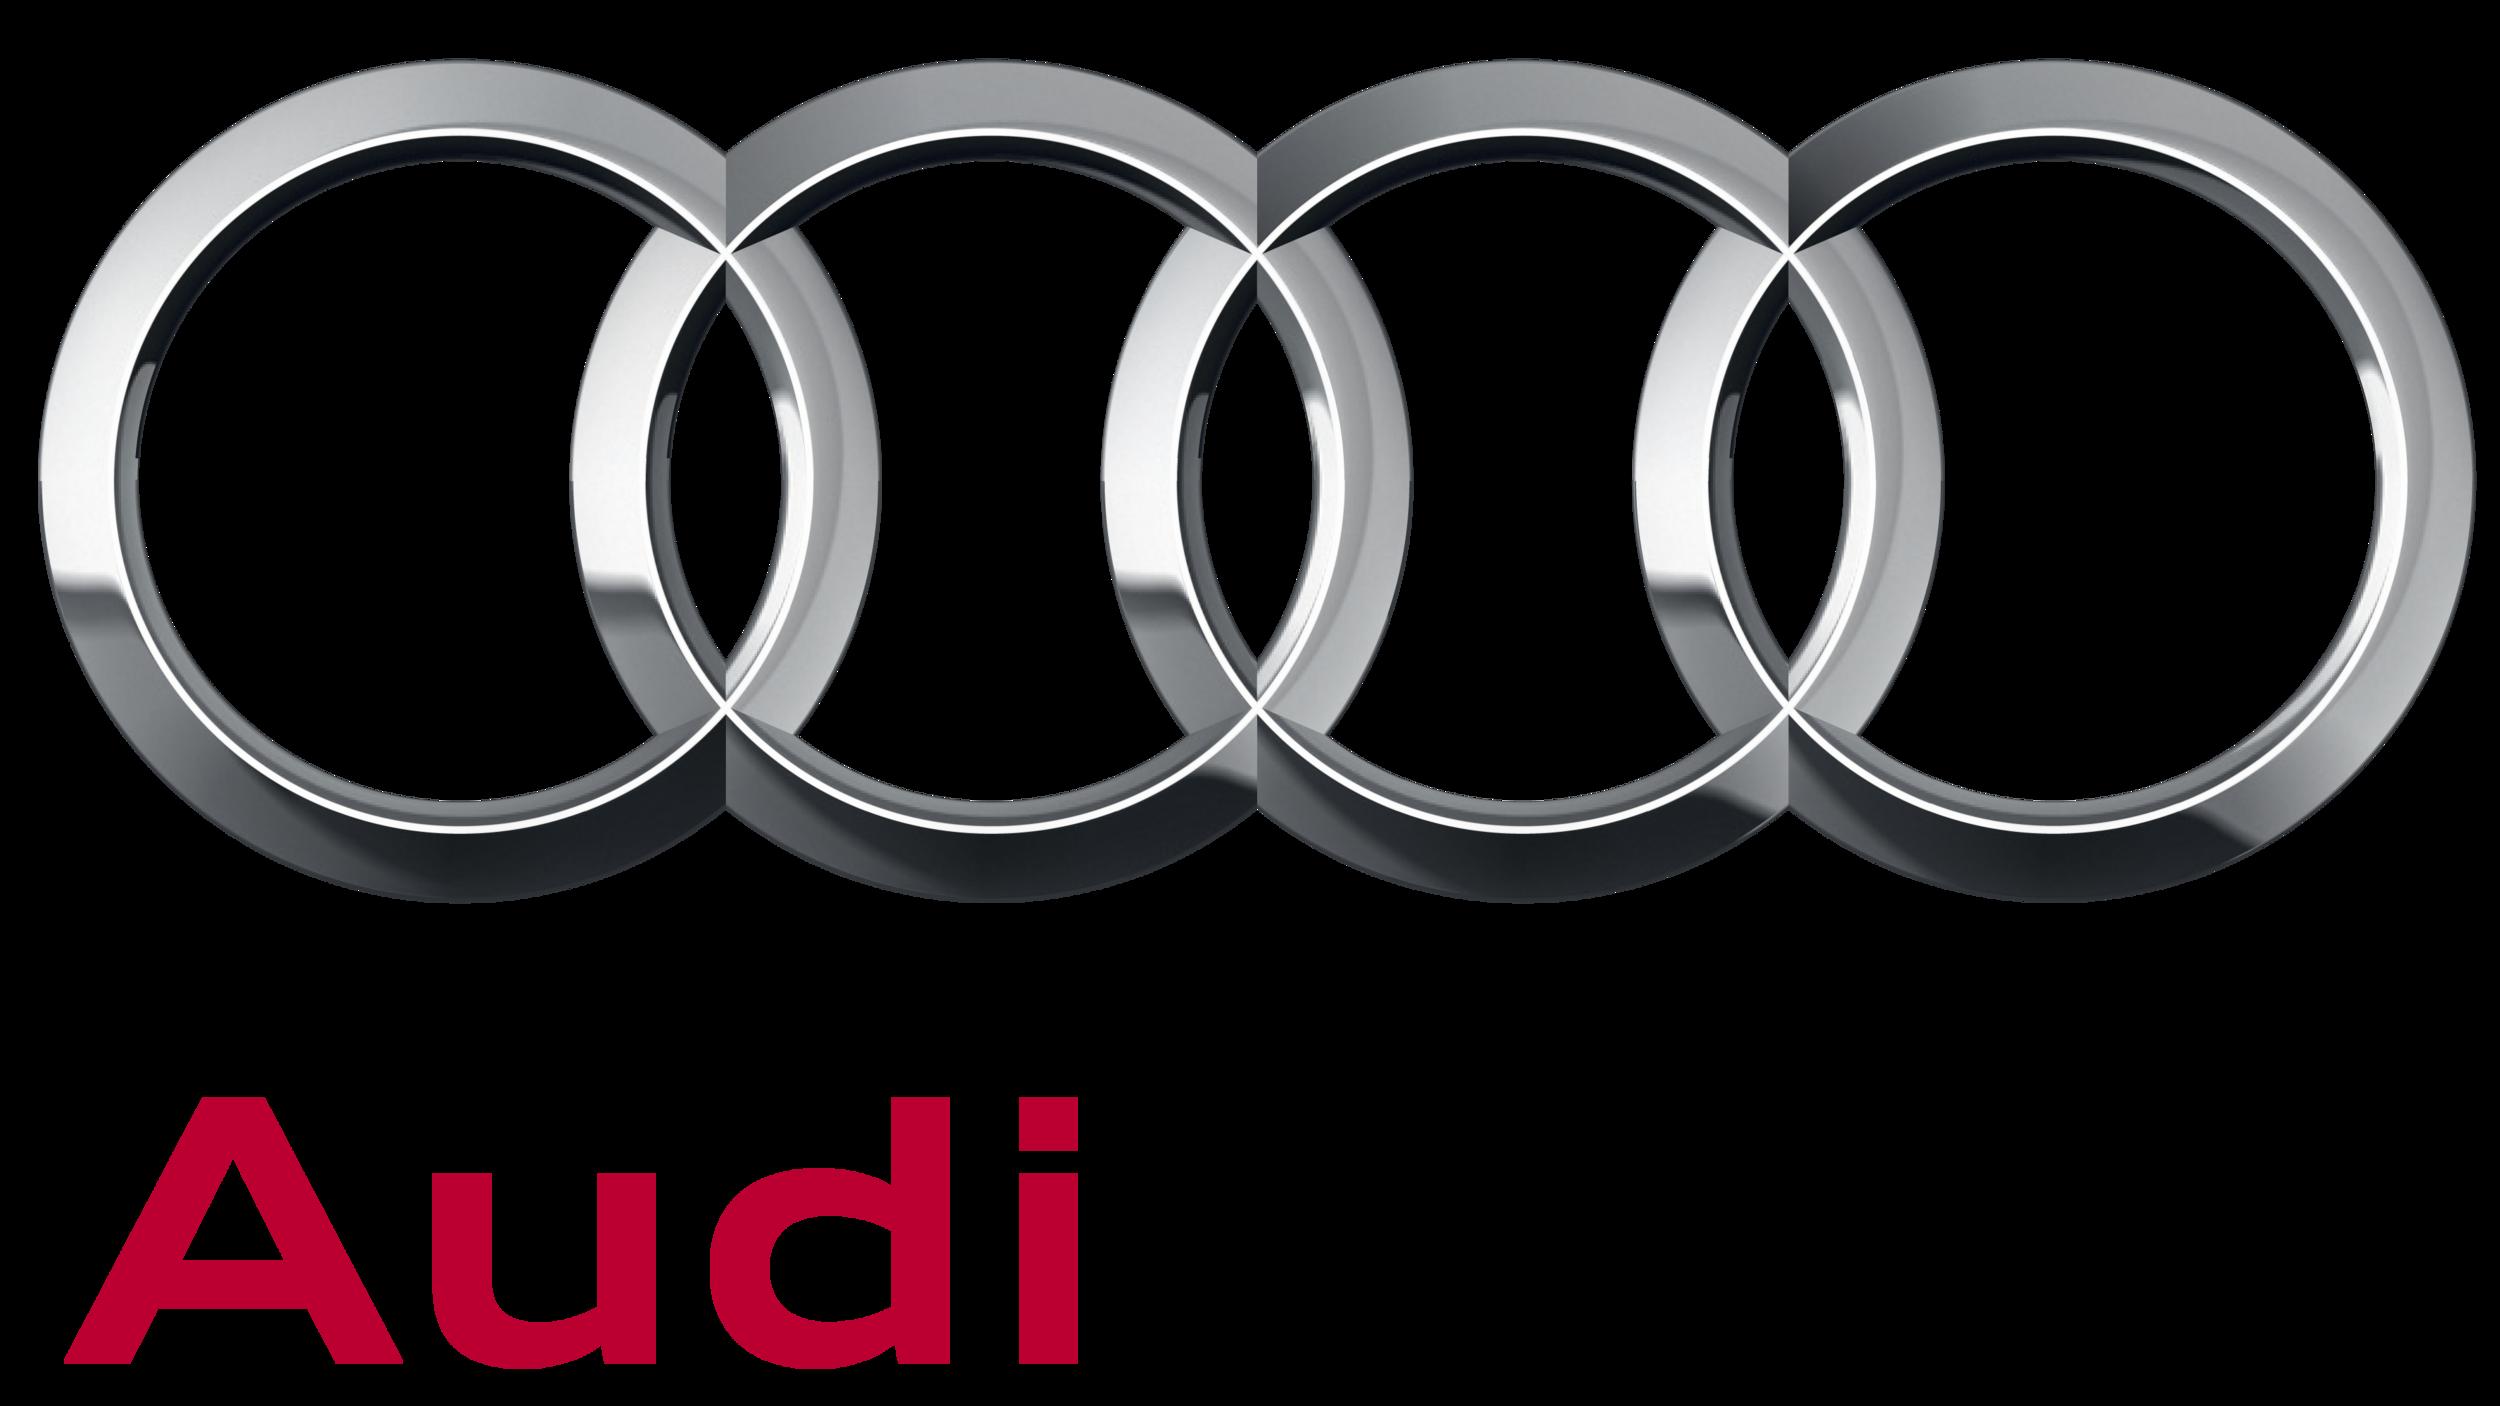 kisspng-audi-s4-car-mercedes-benz-electric-vehicle-audi-5ab51856b94ed6.048019001521817686759.png